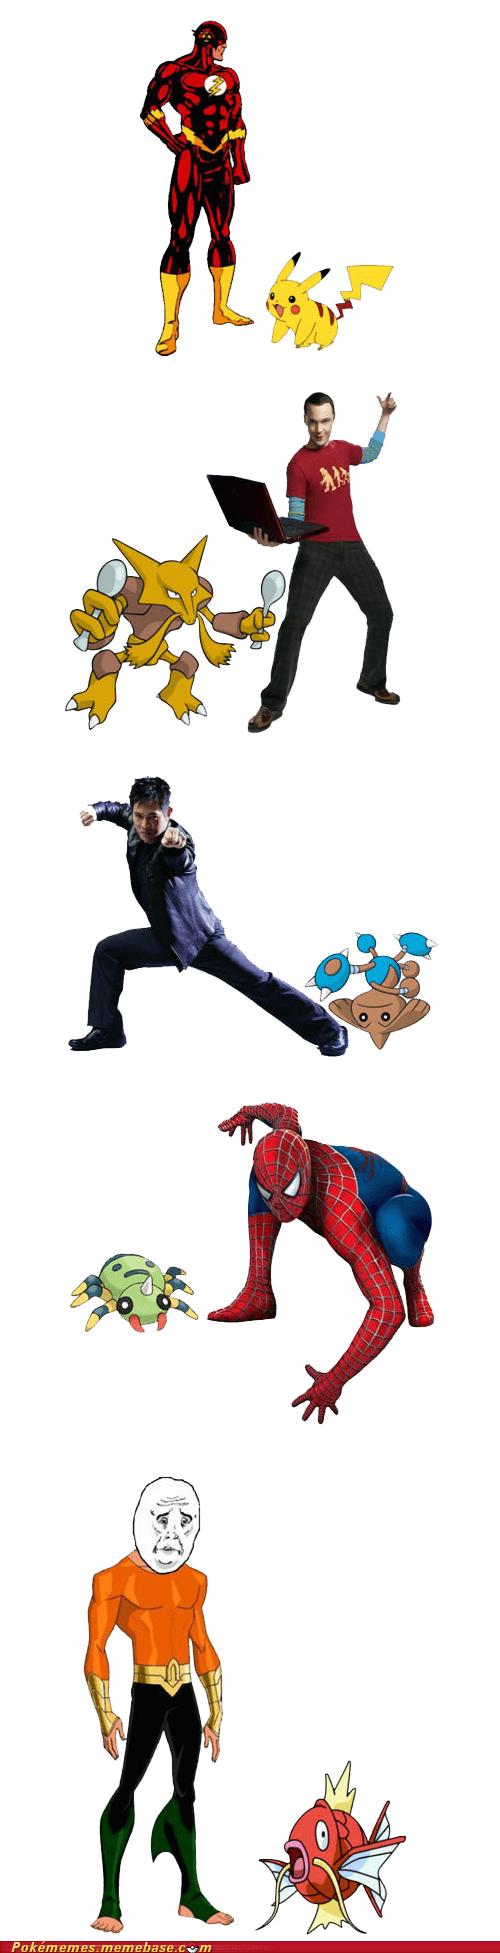 Which Pokémon Represents You?